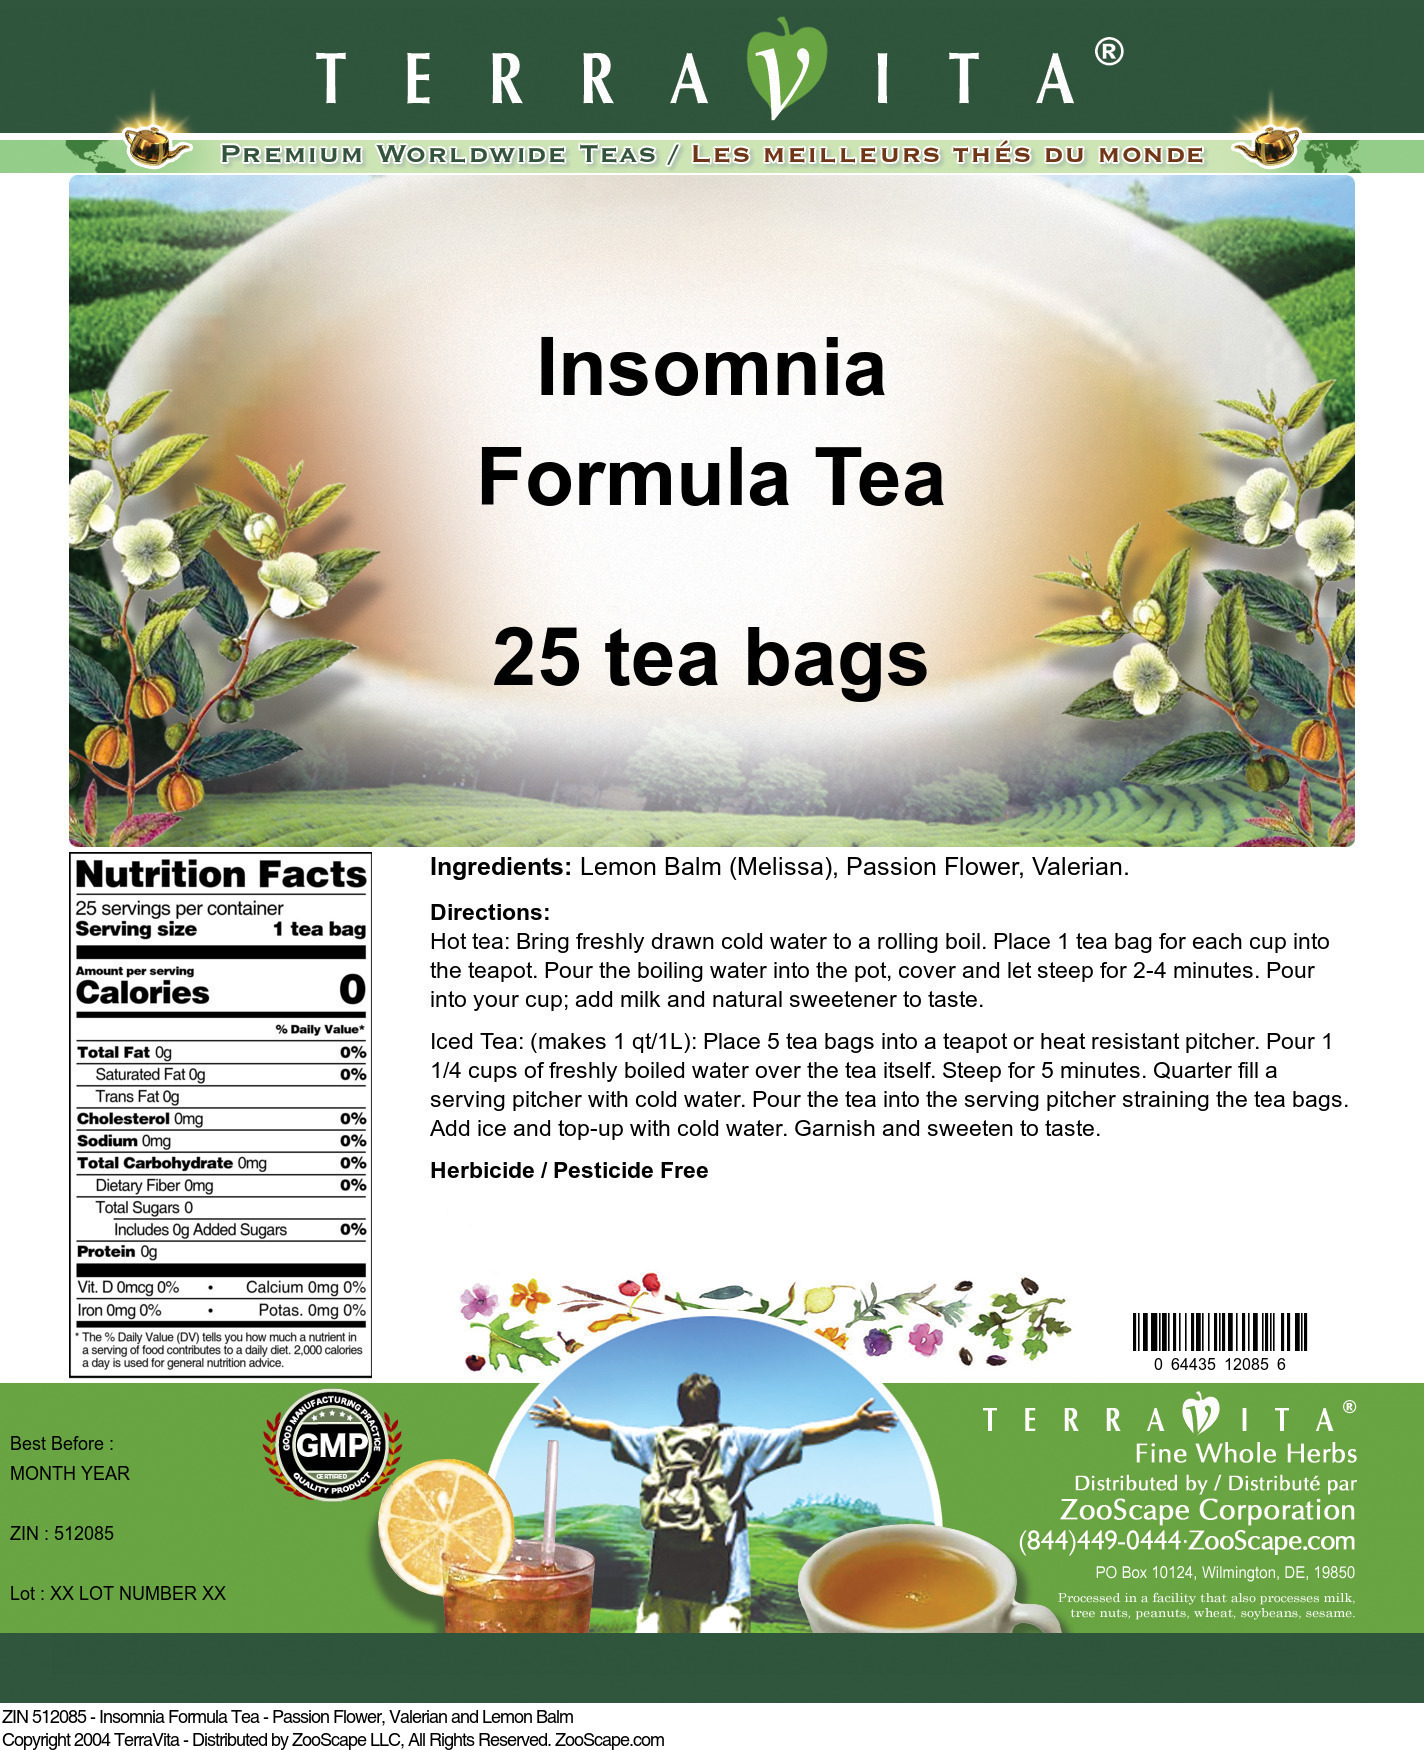 Insomnia Formula Tea - Passion Flower, Valerian and Lemon Balm